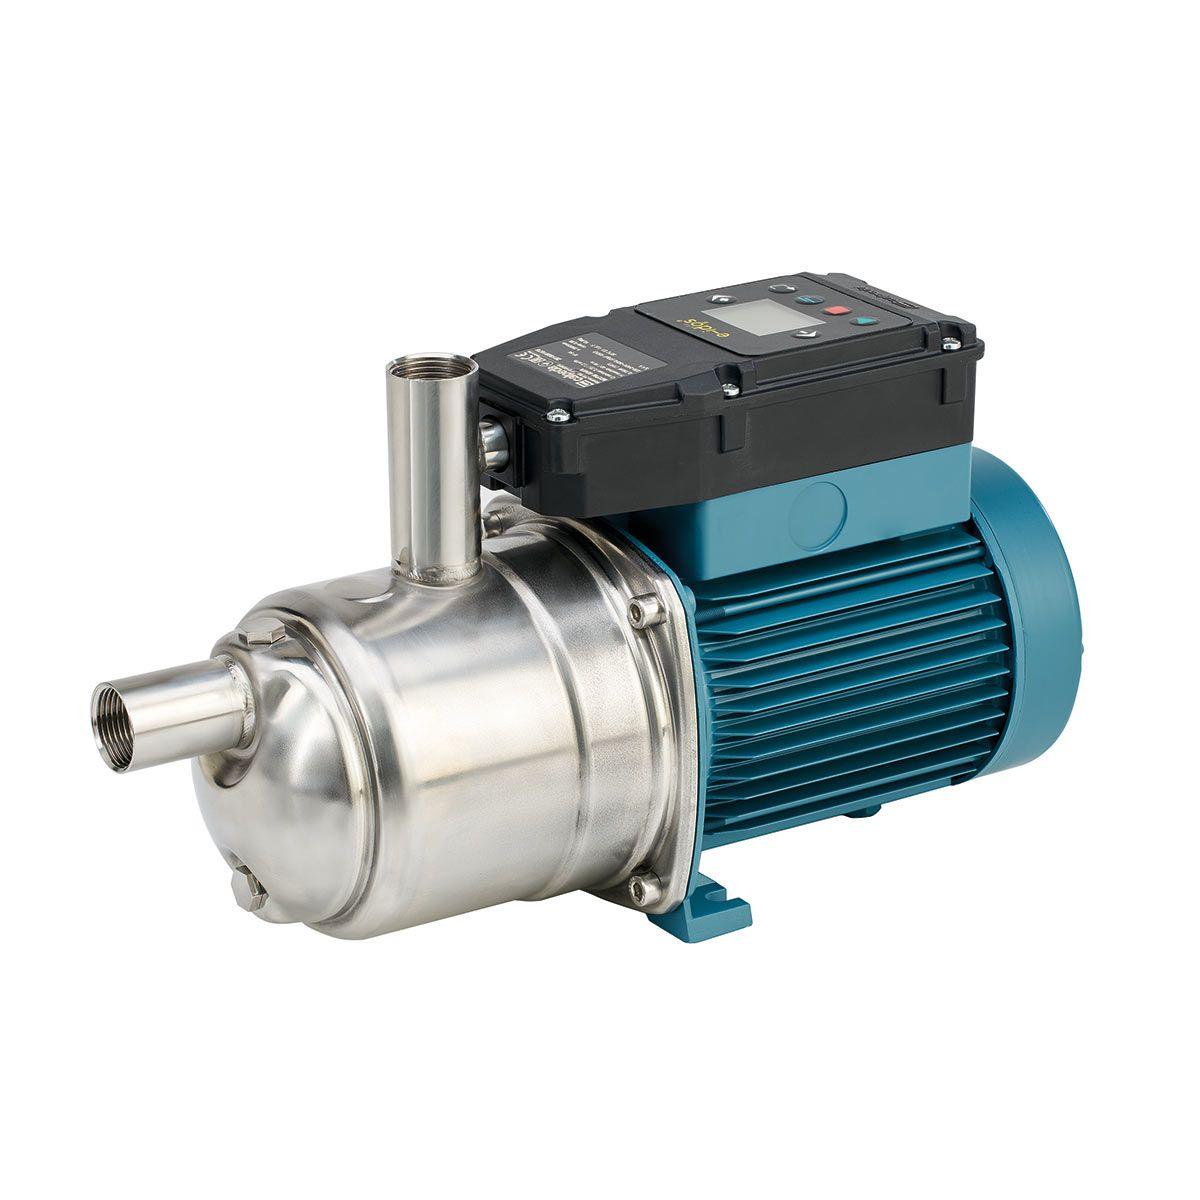 Hauswasserwerk E-NGXM 4/110 PCD, H max. 42 m, Q max. 4500 l/h, 0.89 kW, 420 x 161 x 235 mm, 1' IG, 230 V